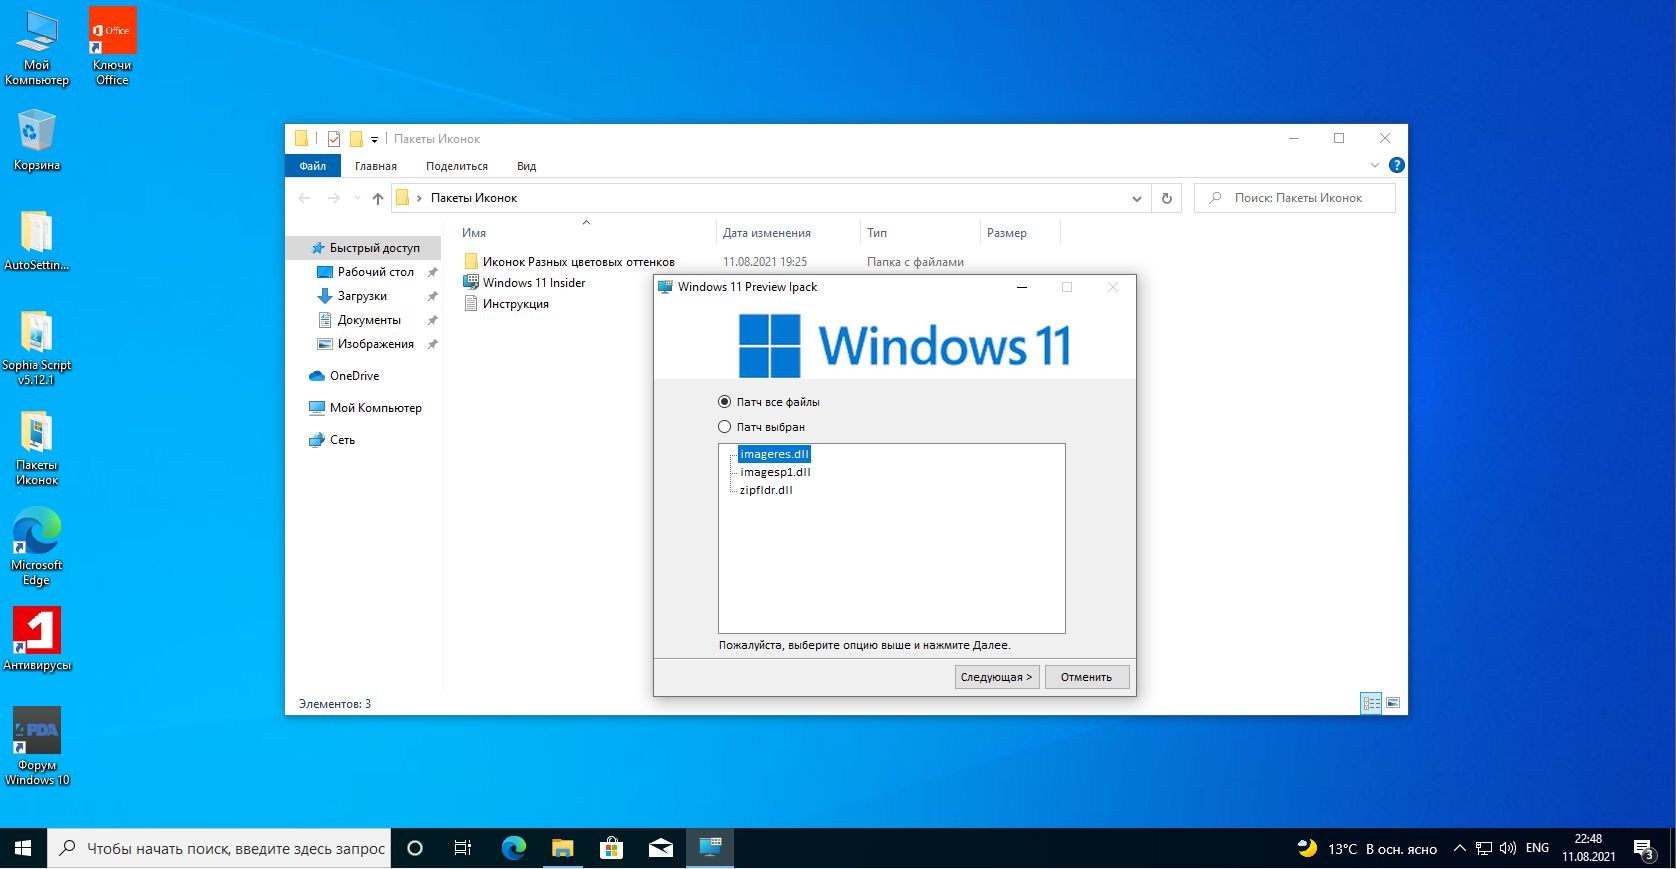 Windows 10 21H2 Build 19043.1165 x64 (11.08.2021) by ArtZak1